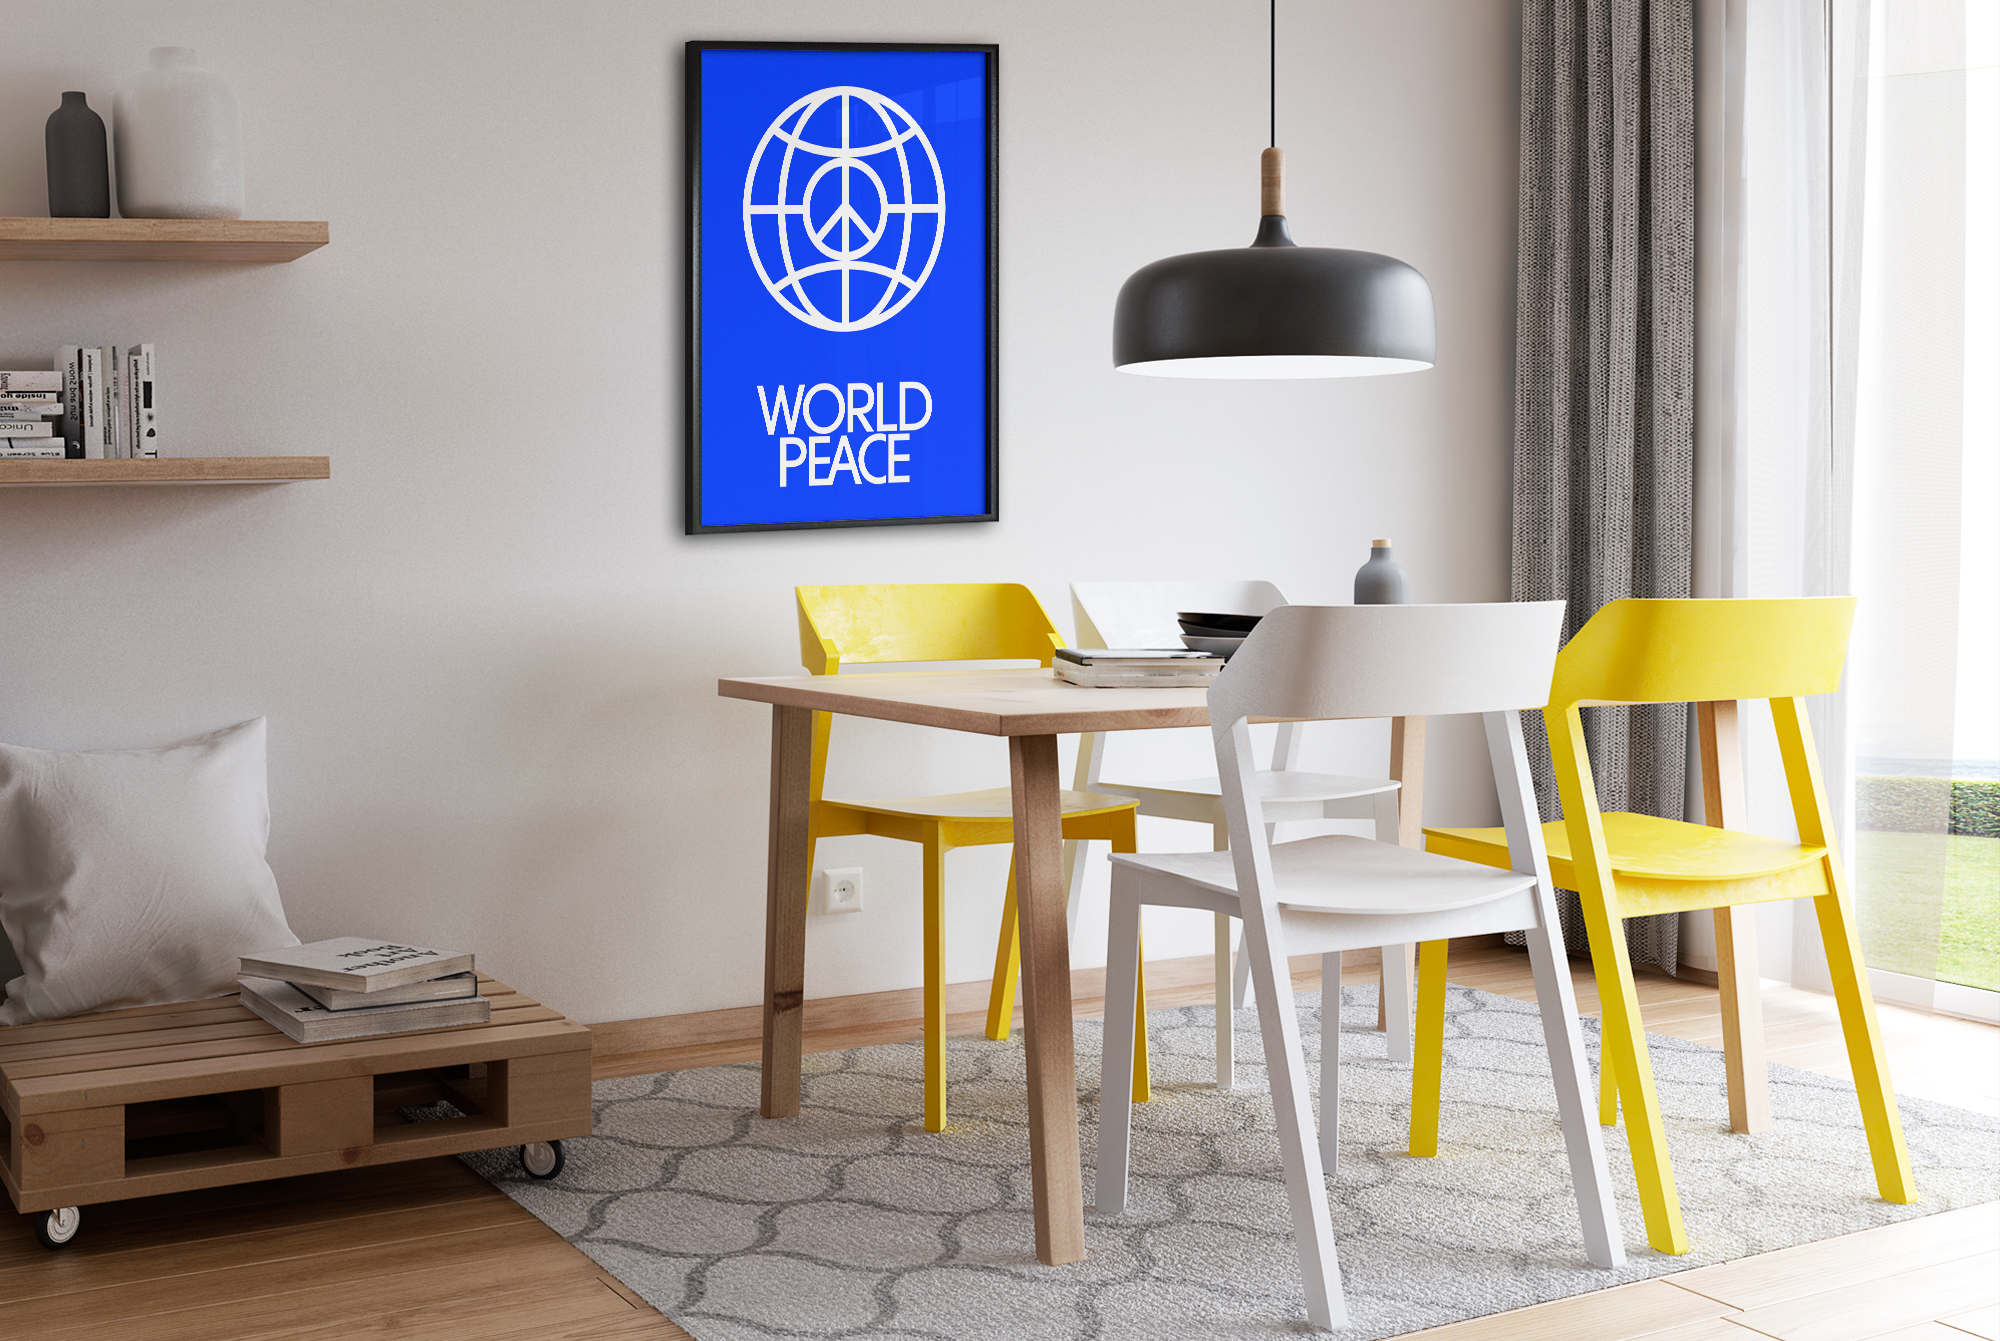 world-peace-poster-gabriel-benderski.png